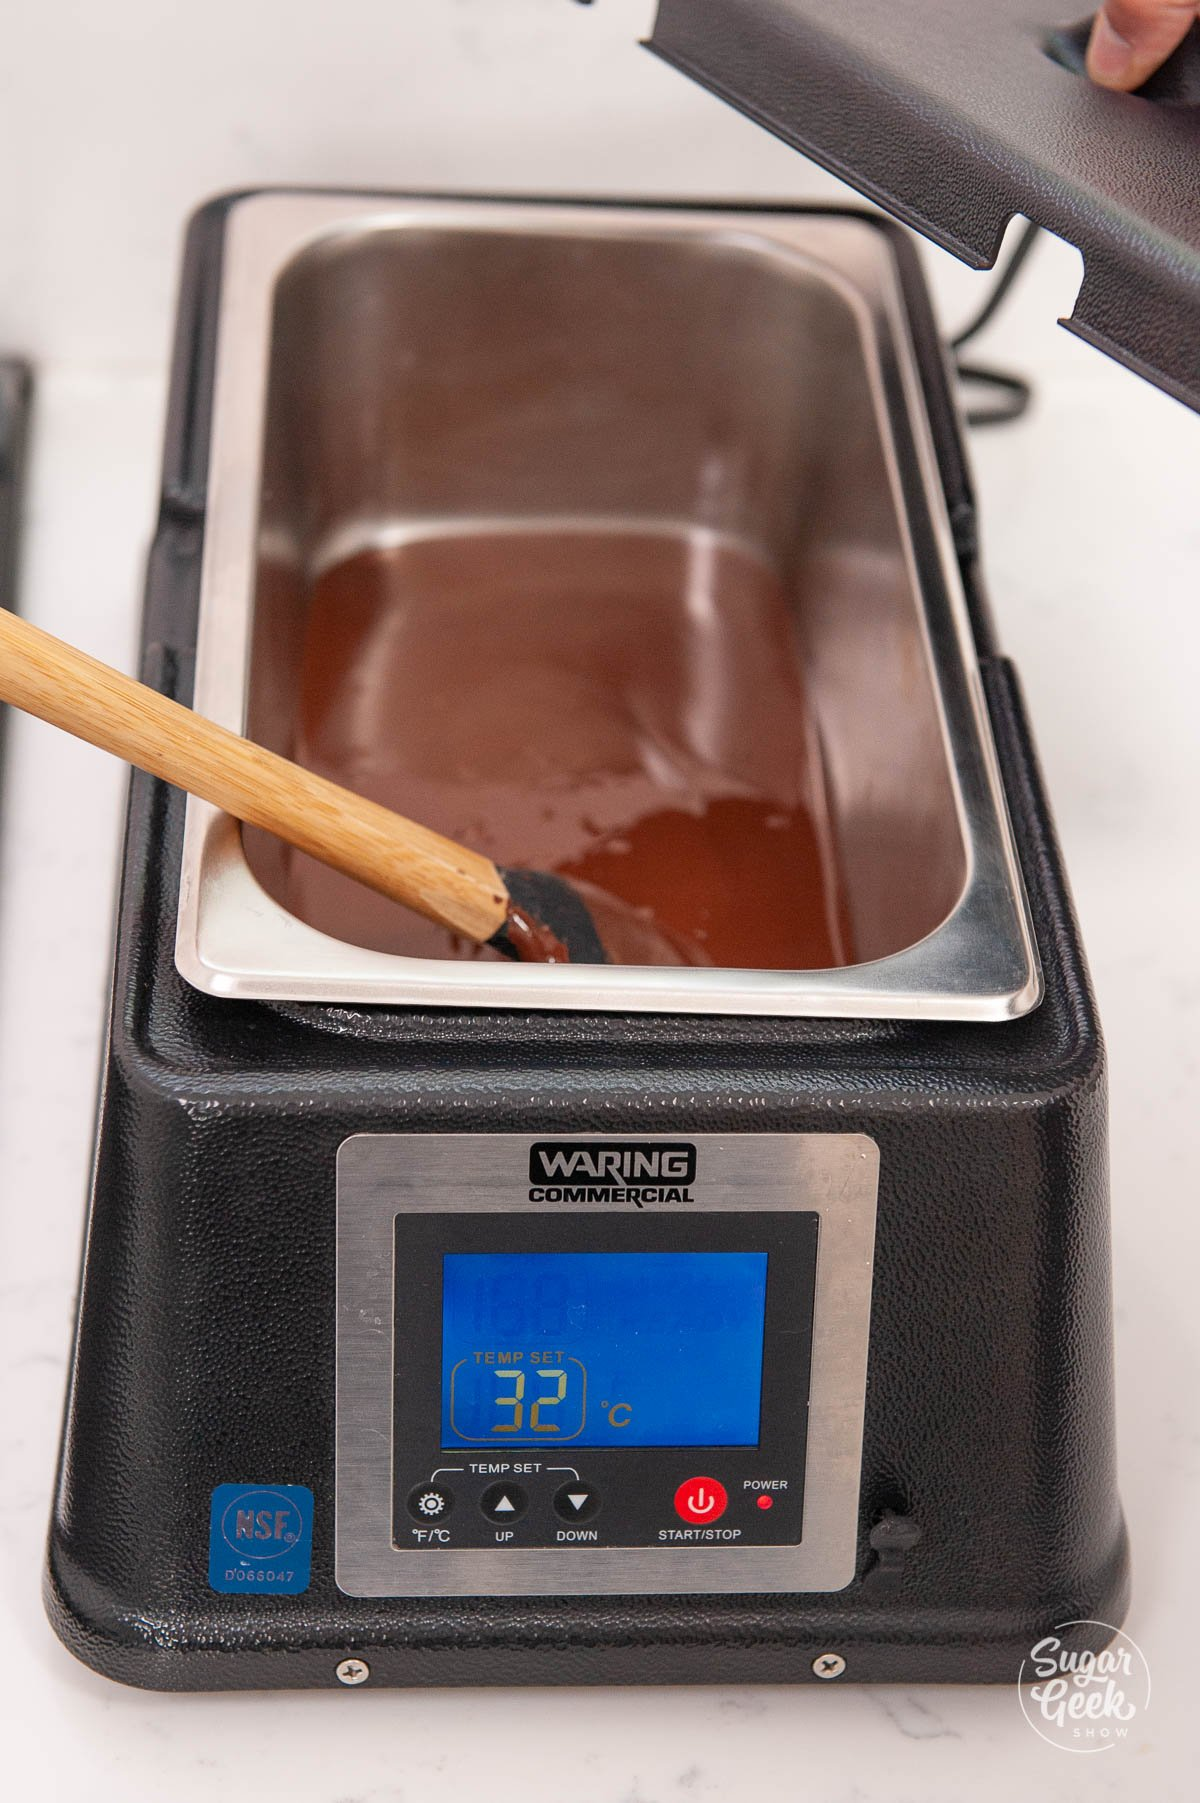 waring chocolate warmer